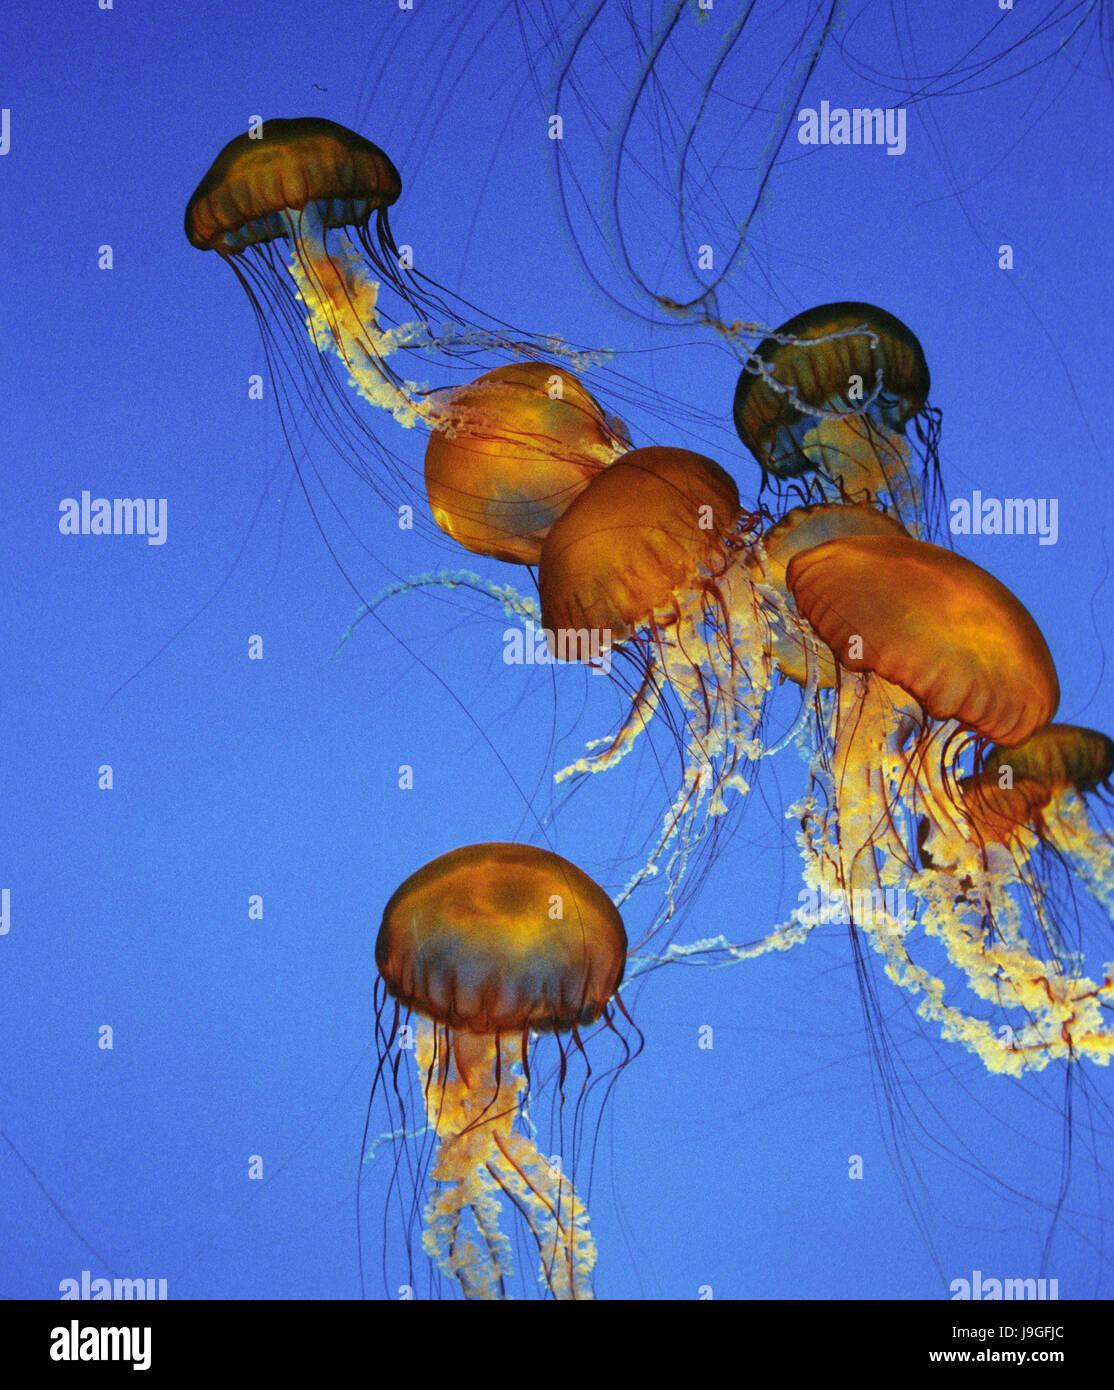 Purple-Stripped Jellyfish, pelagia noctiluca - Stock Image